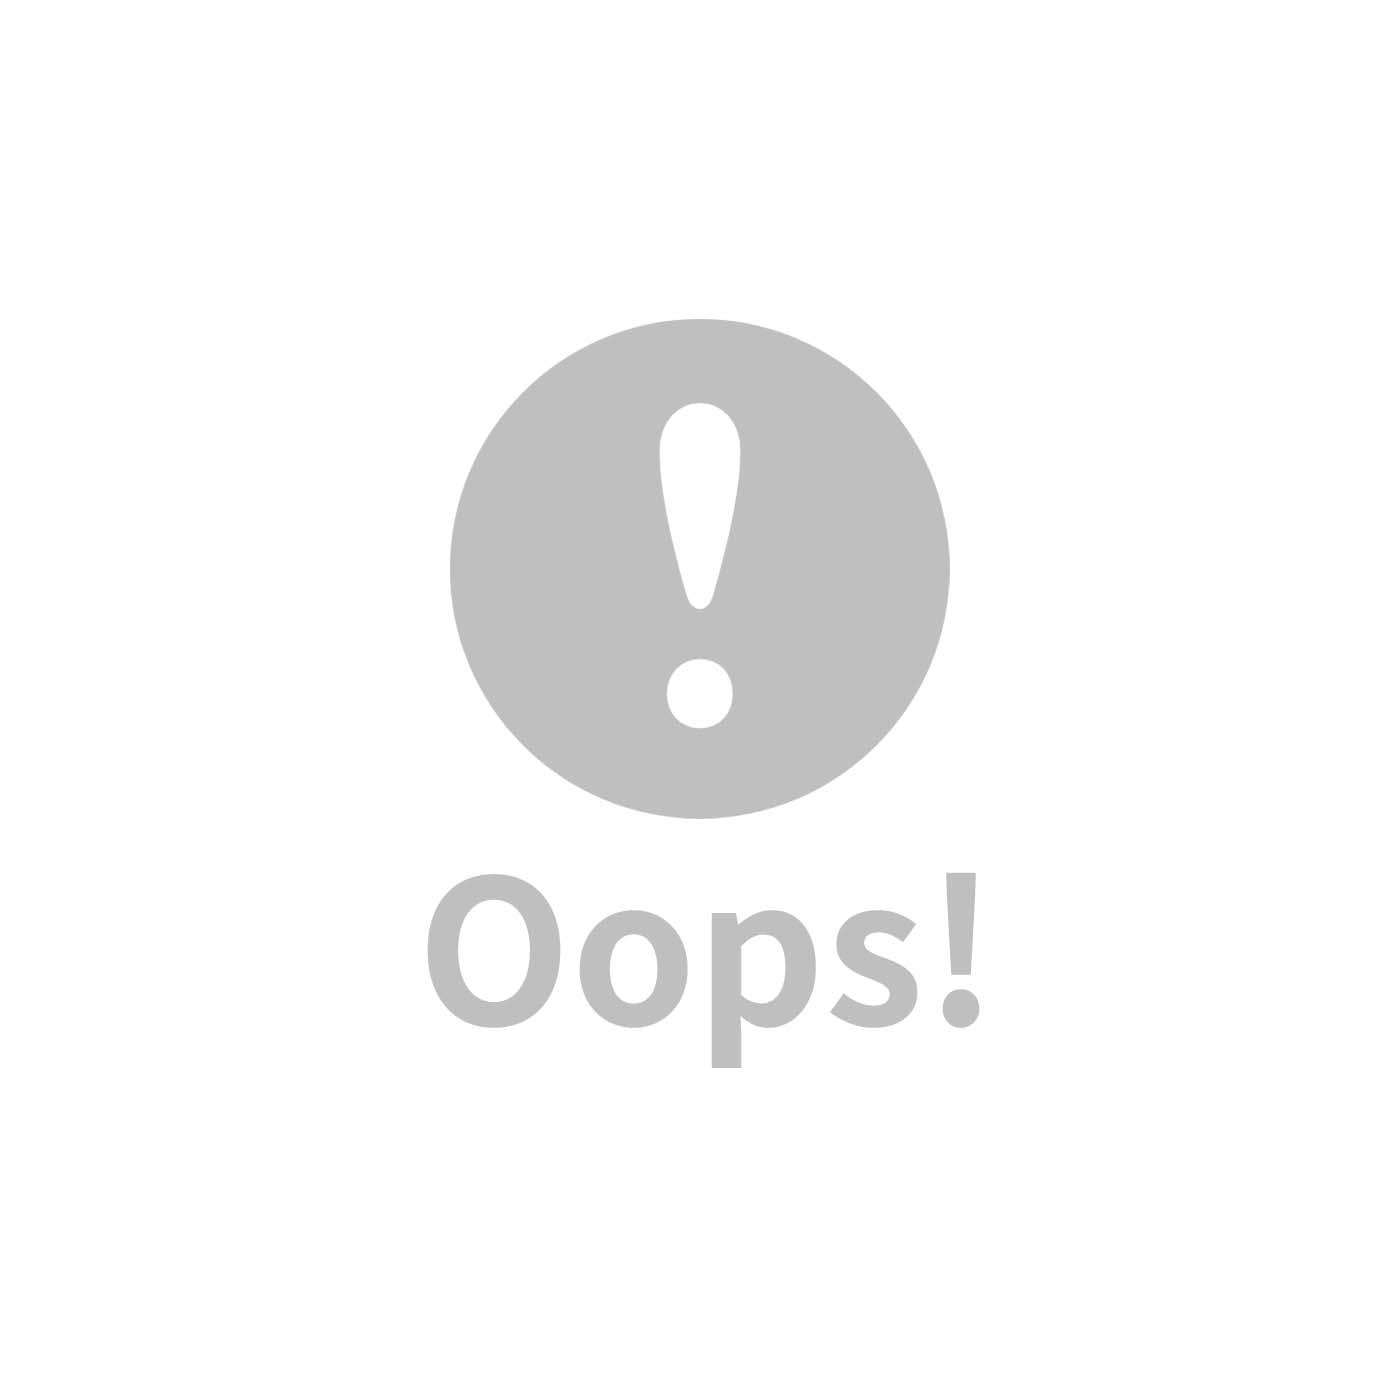 global affairs 童話手工編織安撫搖鈴_鼠叔系列(2入組)